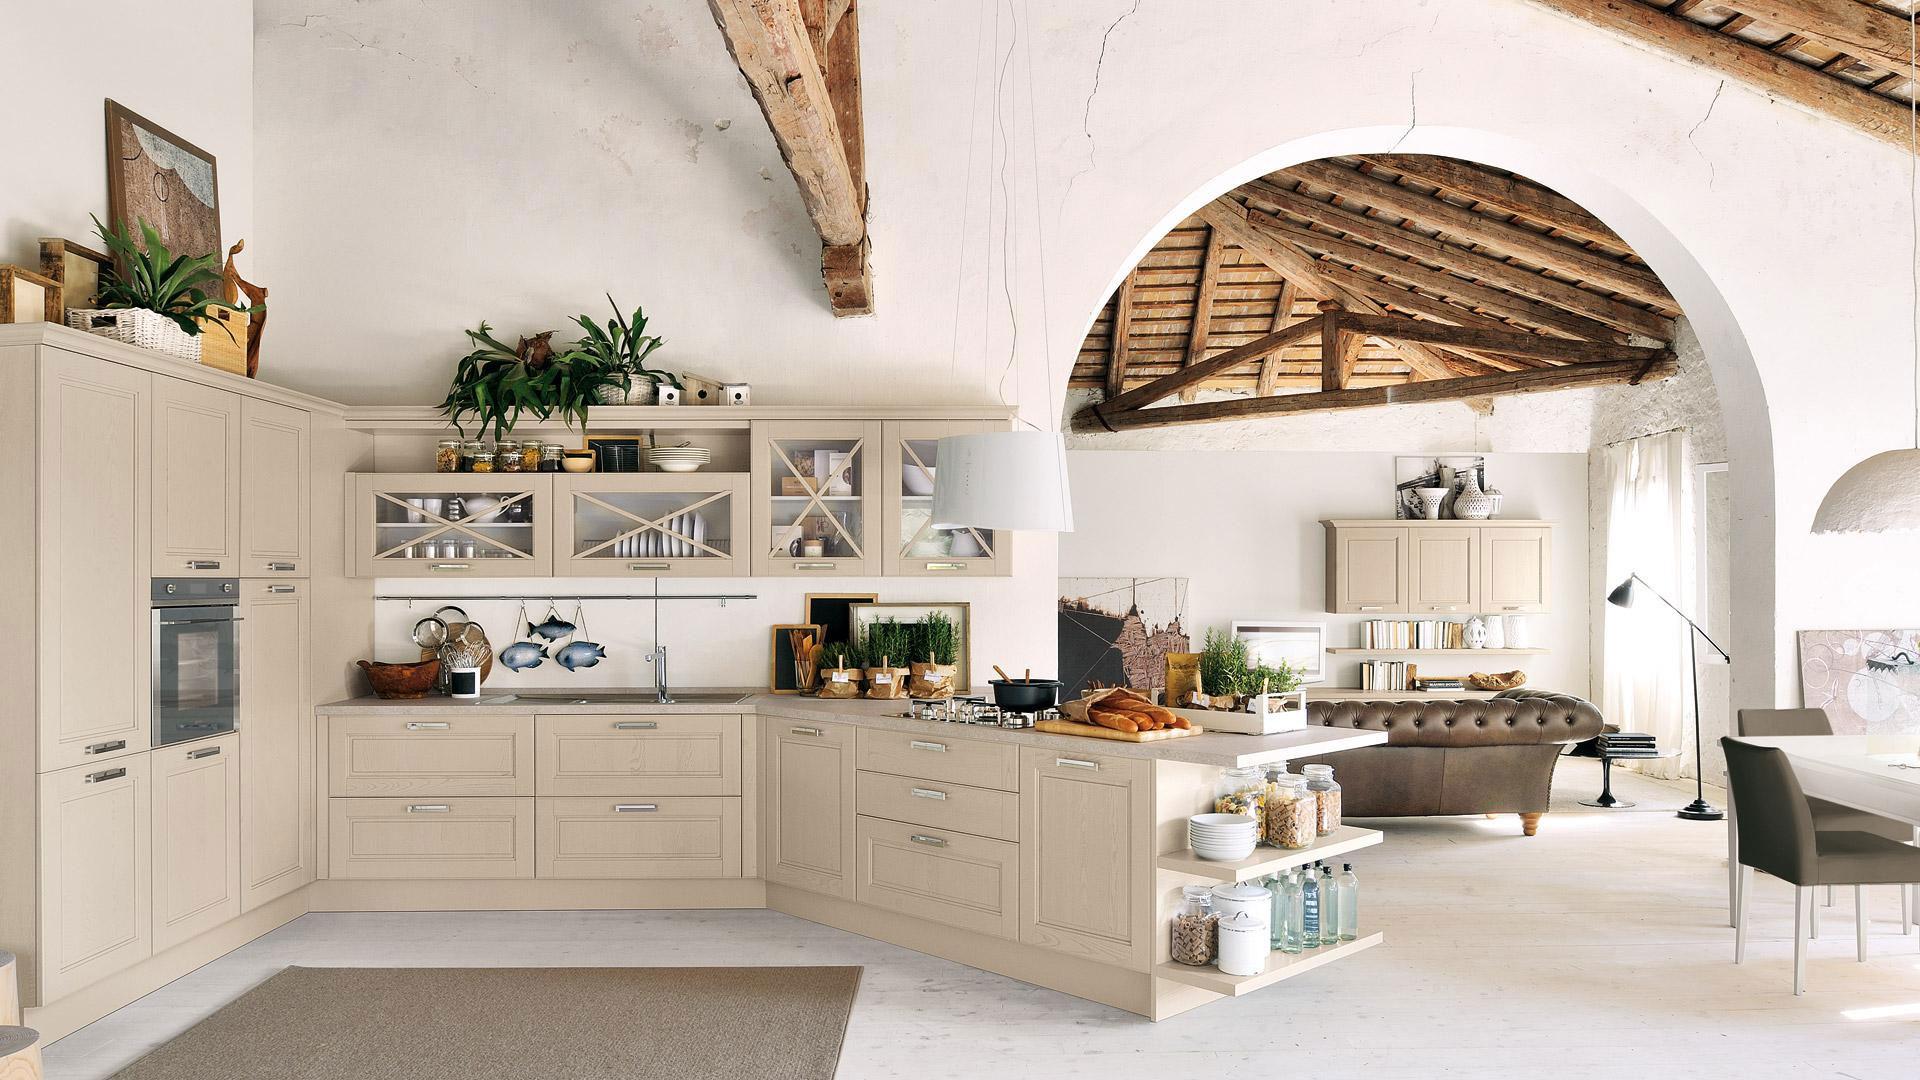 Arredo Cucina Prezzi. Free Cucine Scavolini Cucine Lube Arrital ...